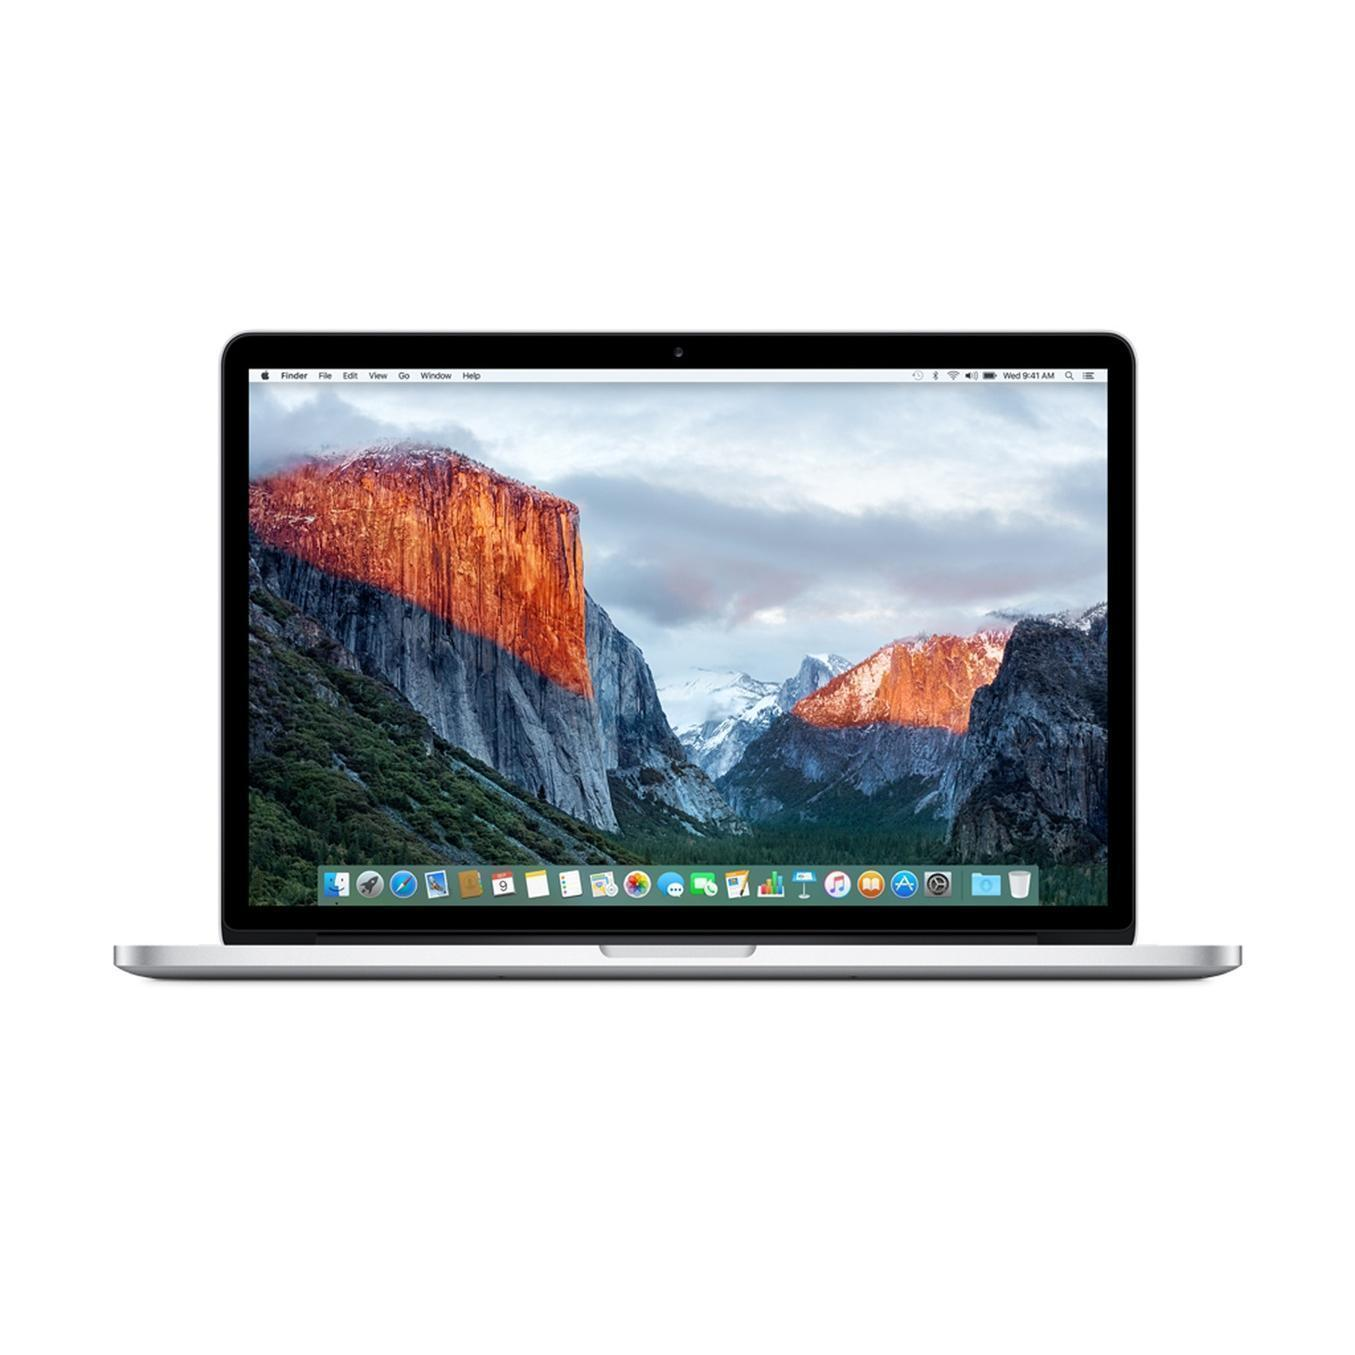 "MacBook Pro 15"" Retina (2013) - Core i7 2,4 GHz - SSD 256 GB - 8GB - QWERTY - Englisch (US)"